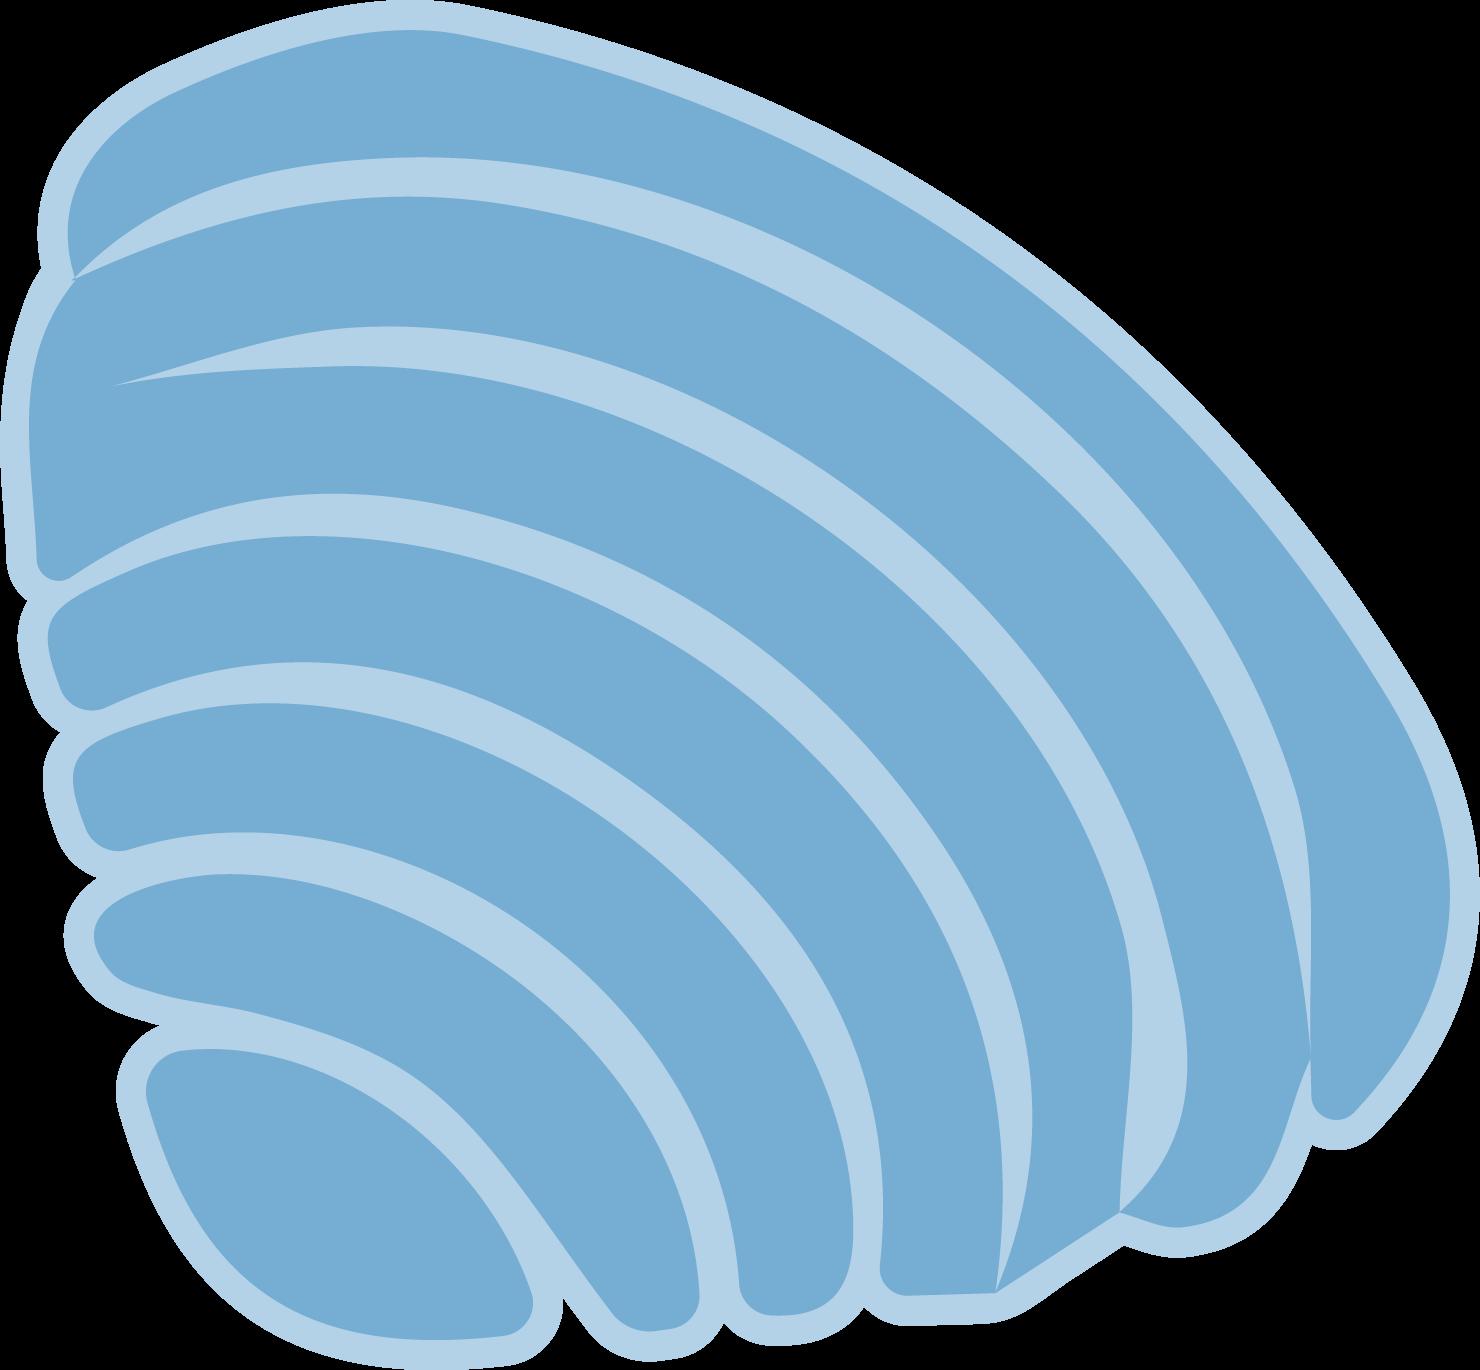 Deep Blue Seashell #2 SVG Cut File